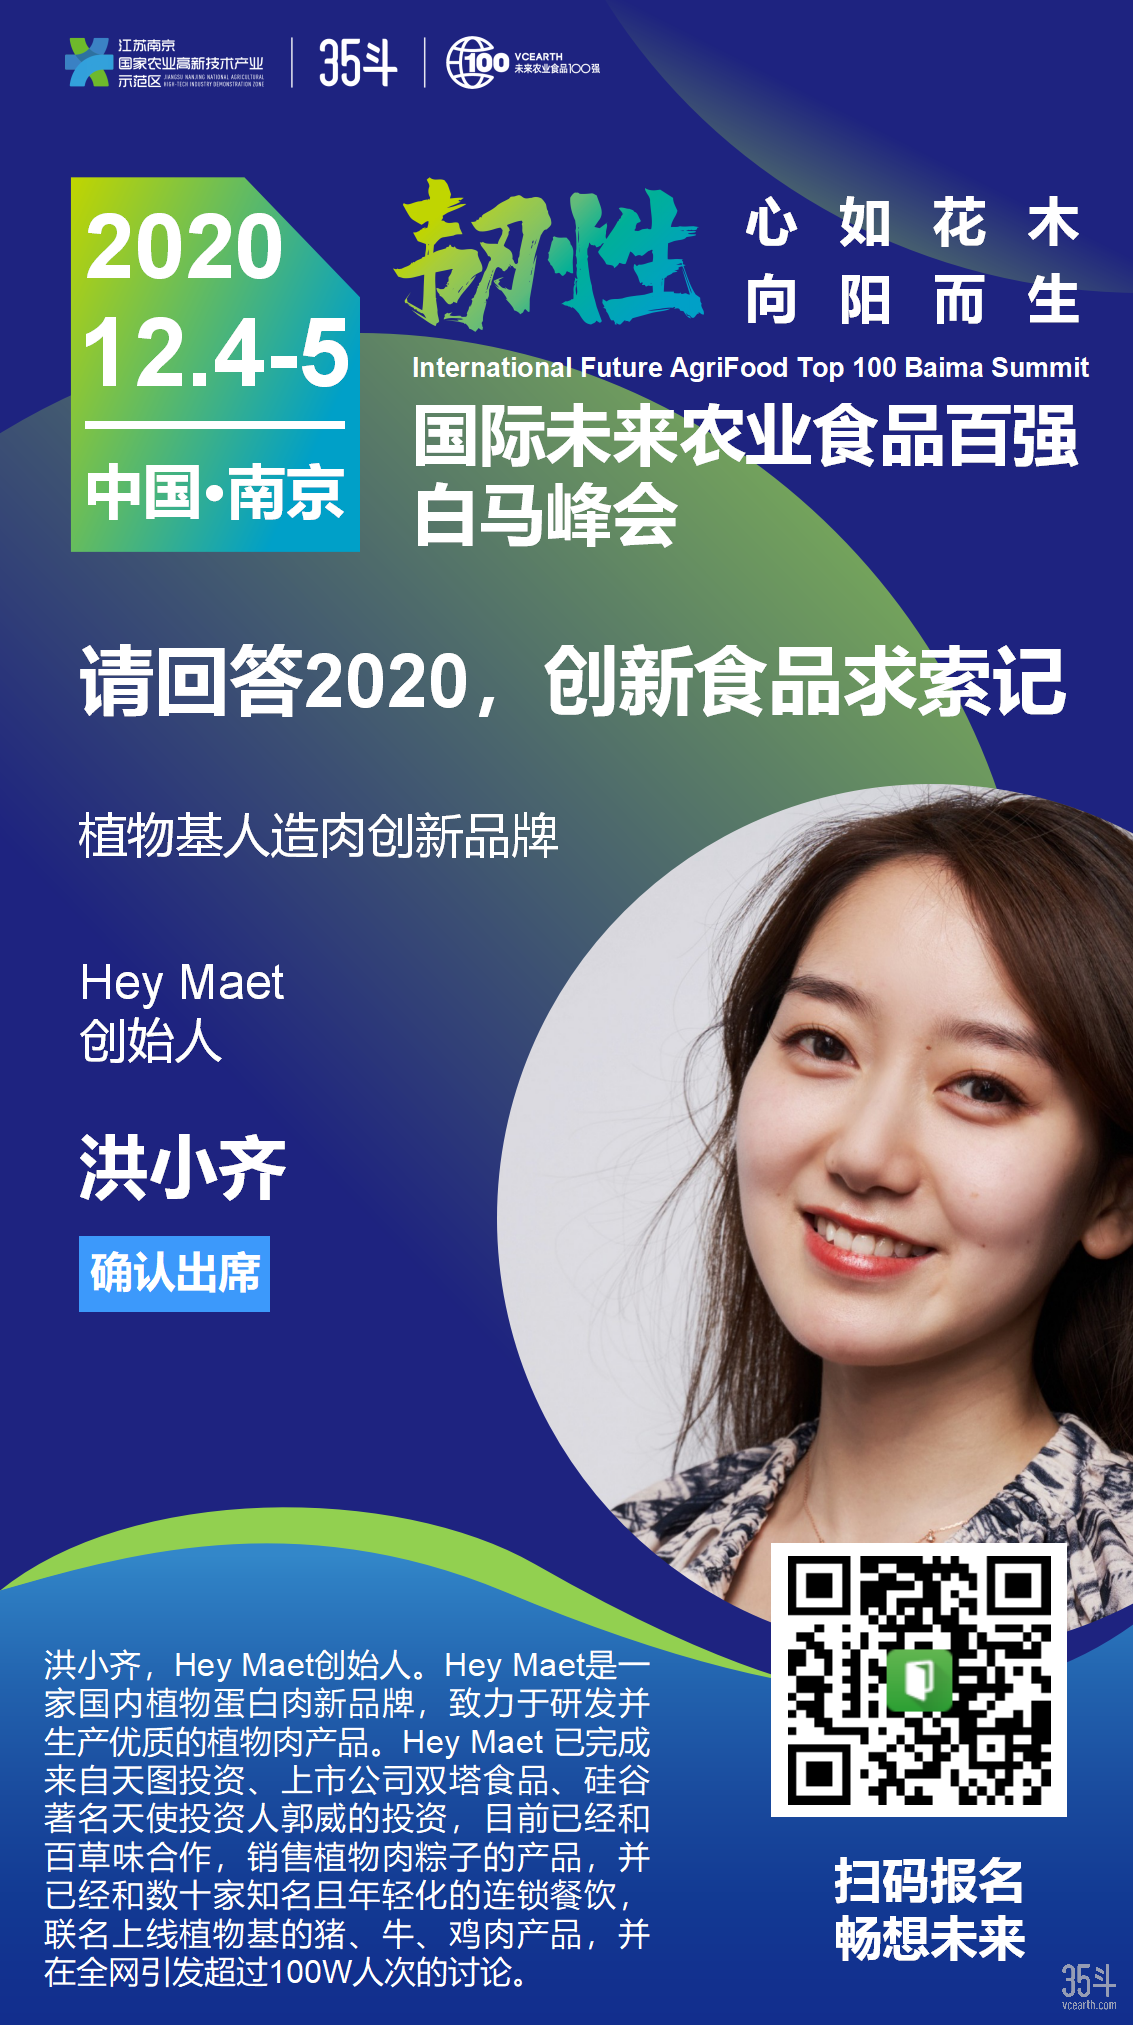 Hey Maet-洪小齐_01.png